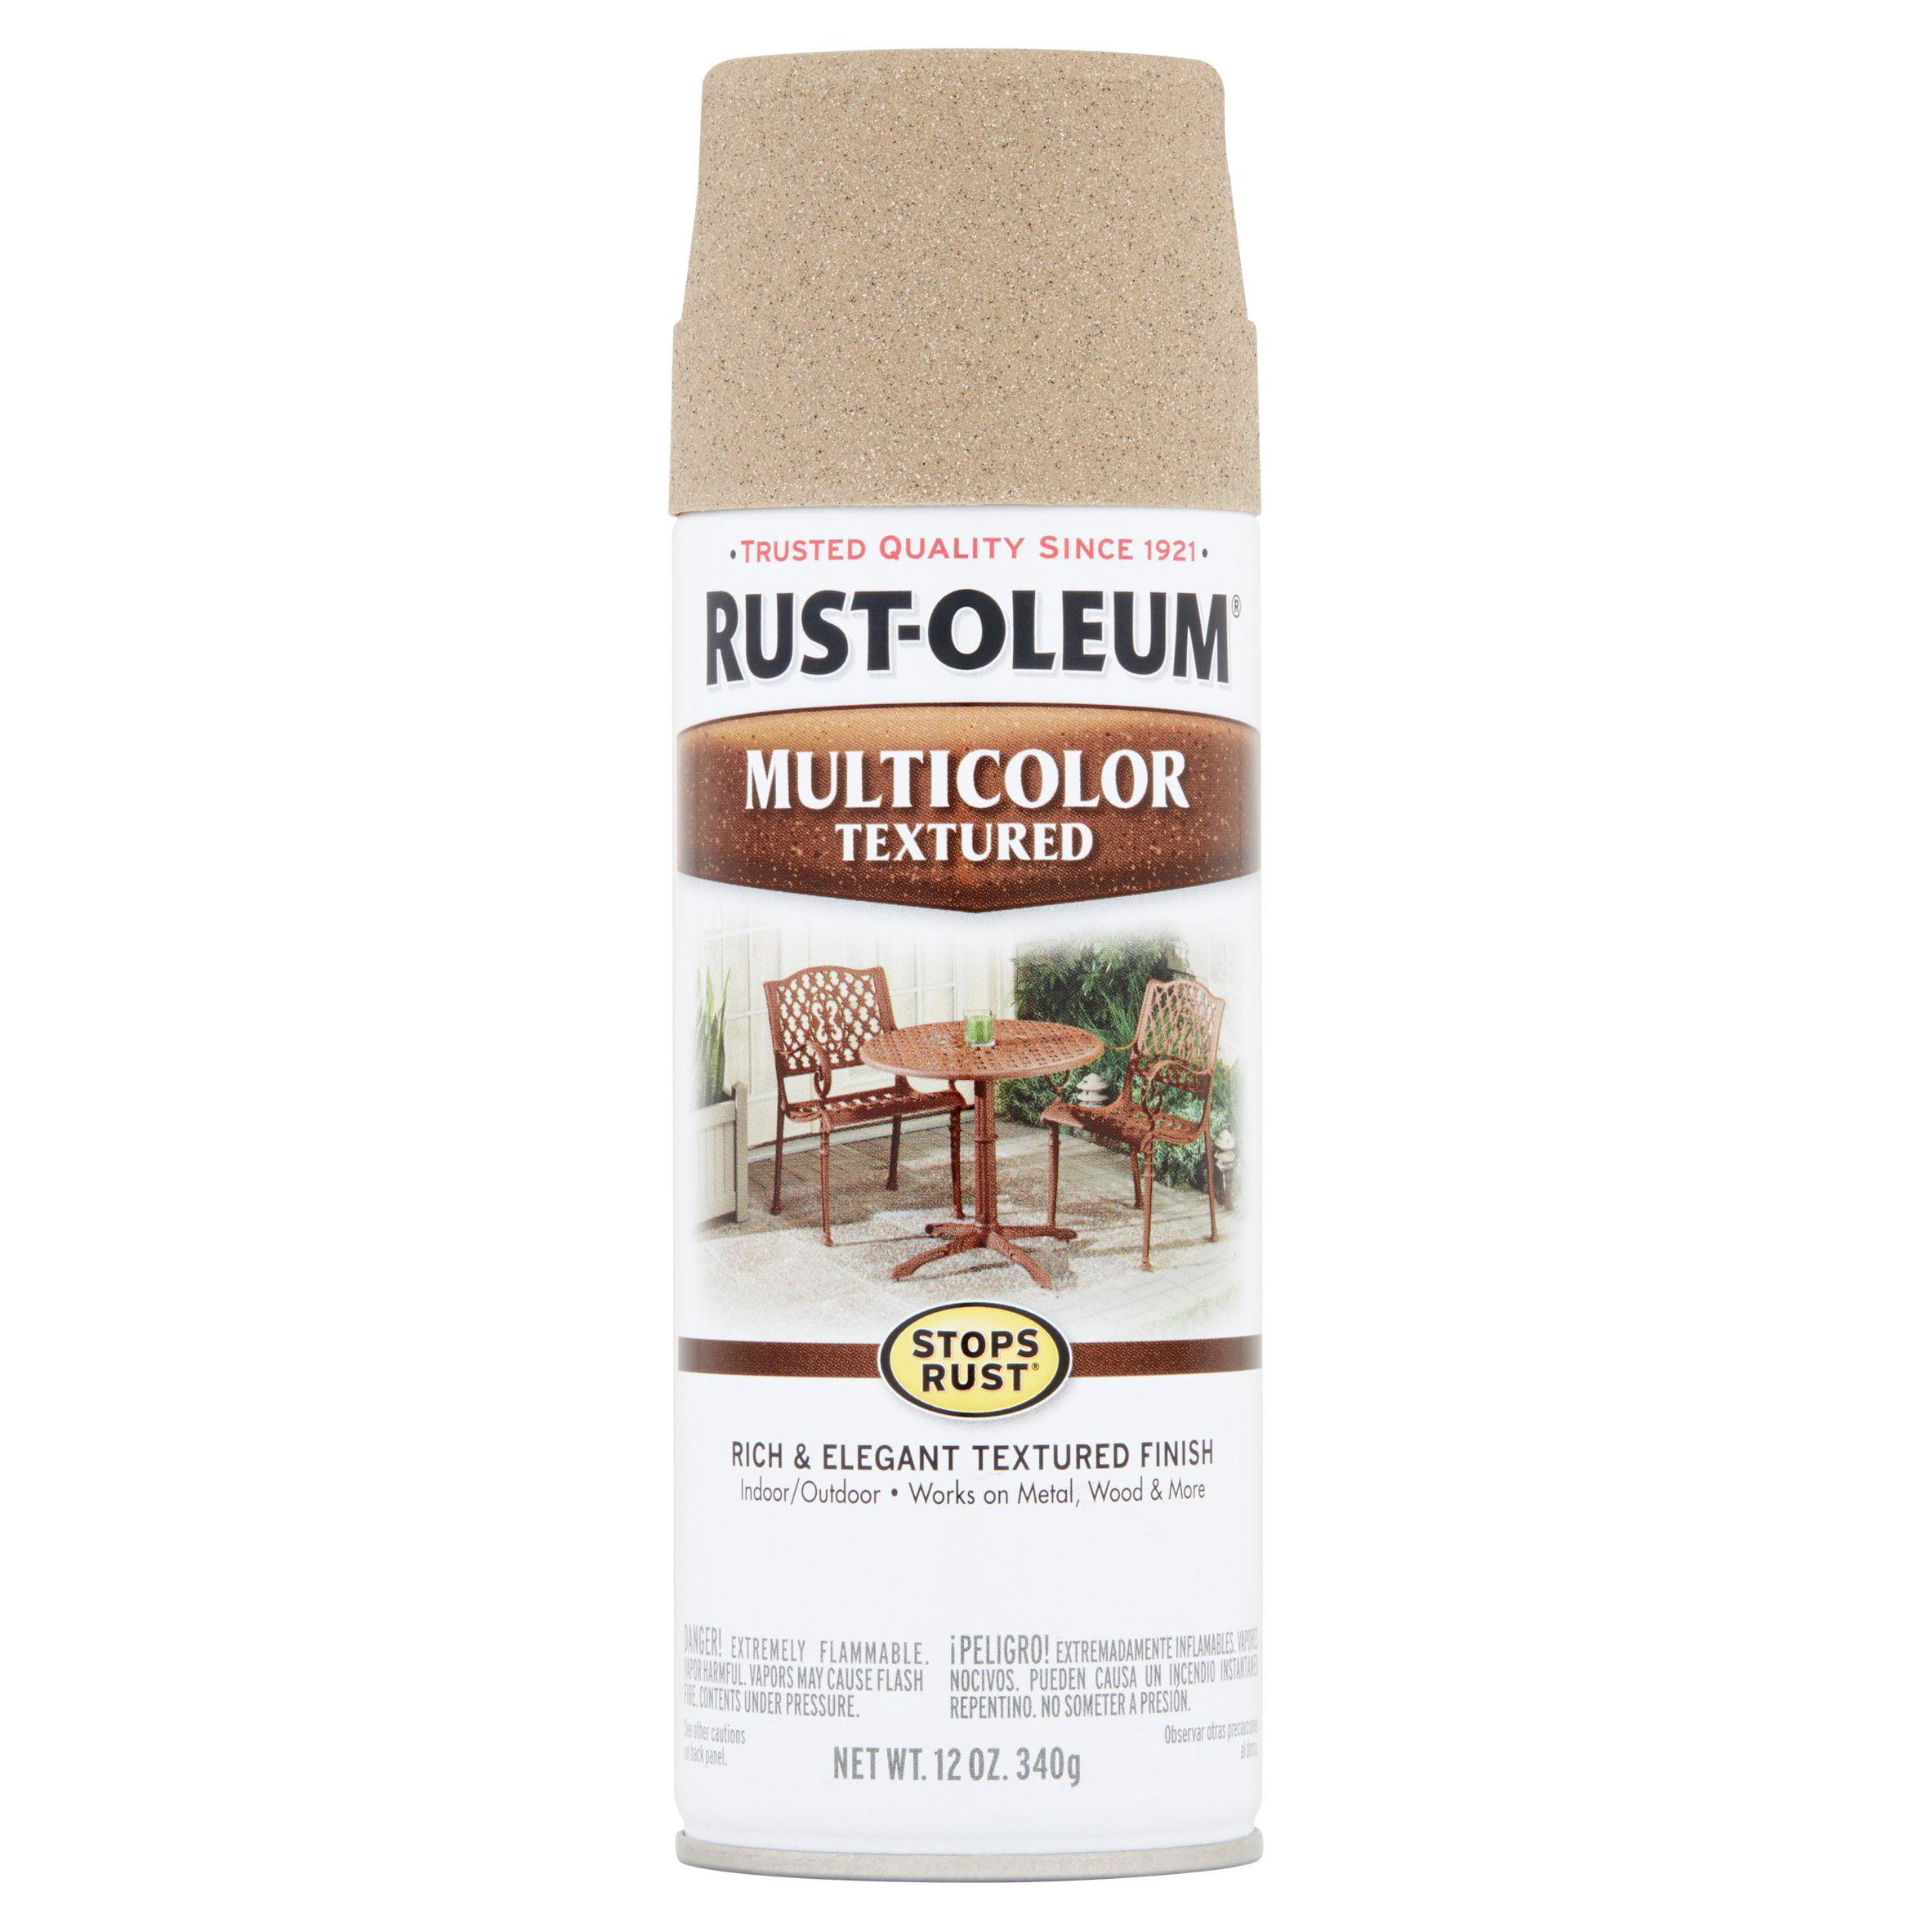 Rust-Oleum Stops Rust Multicolor Textured Desert Bisque Spray Paint, 12 oz